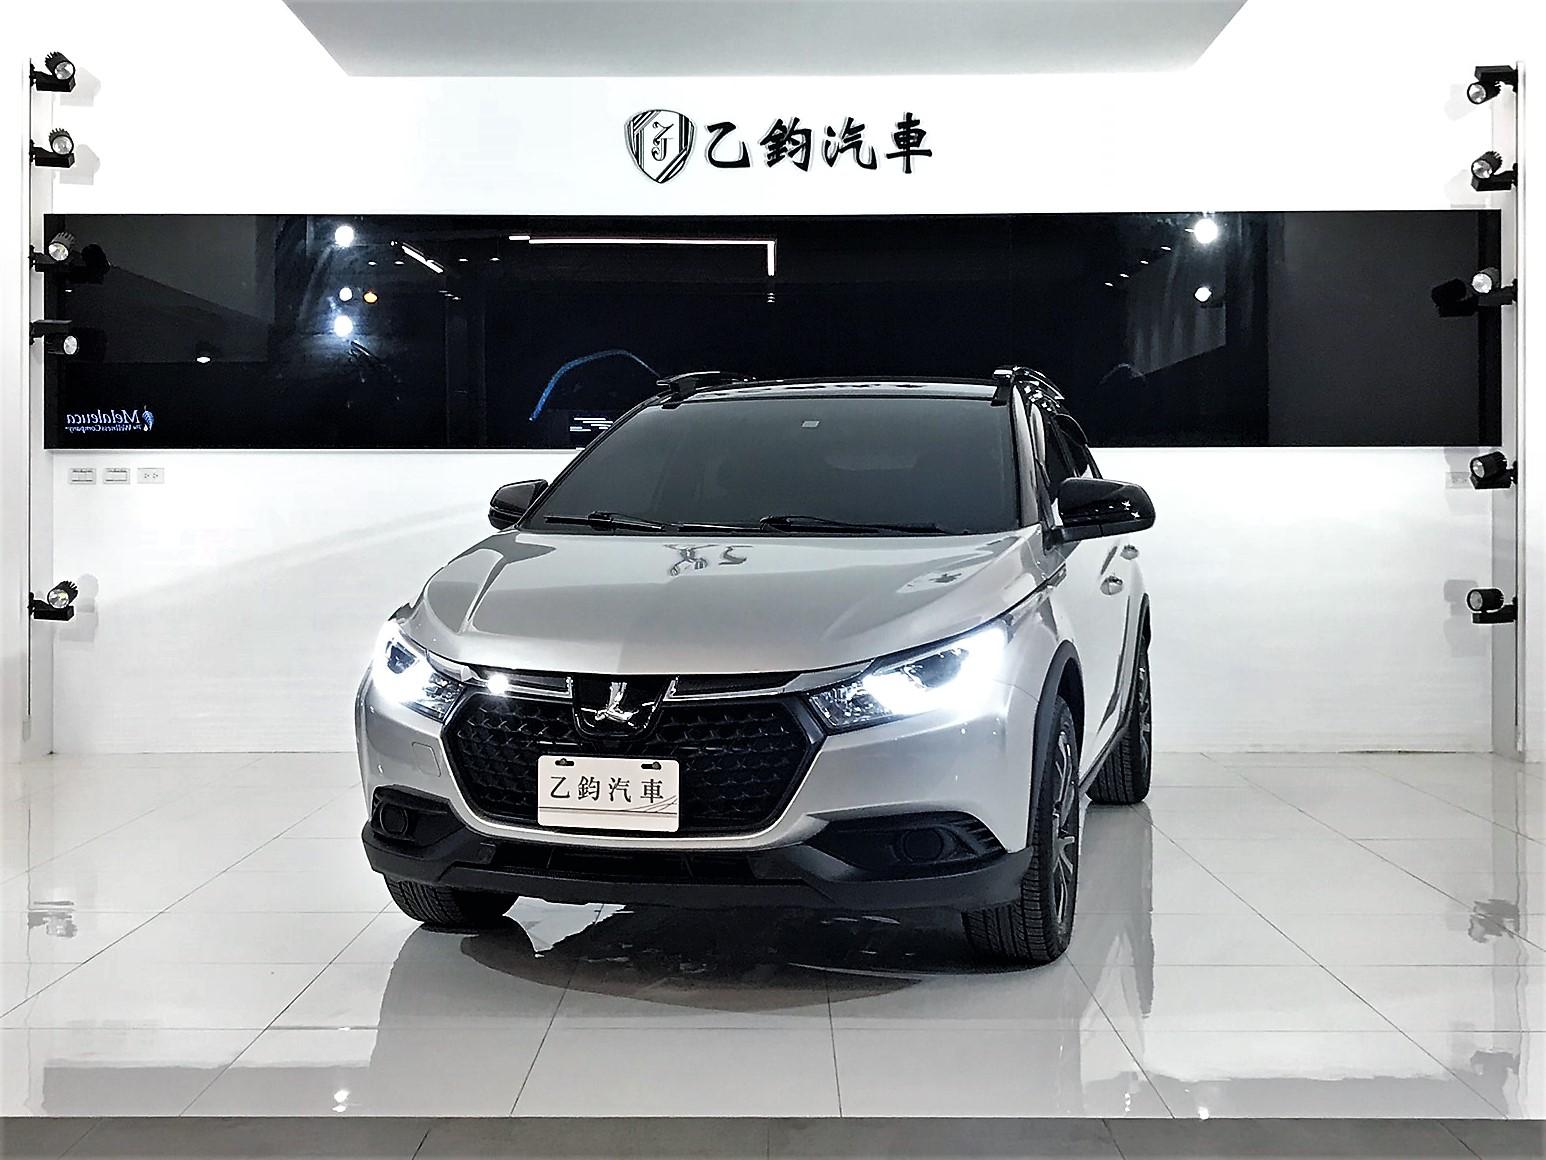 2018 Luxgen 納智捷 U5